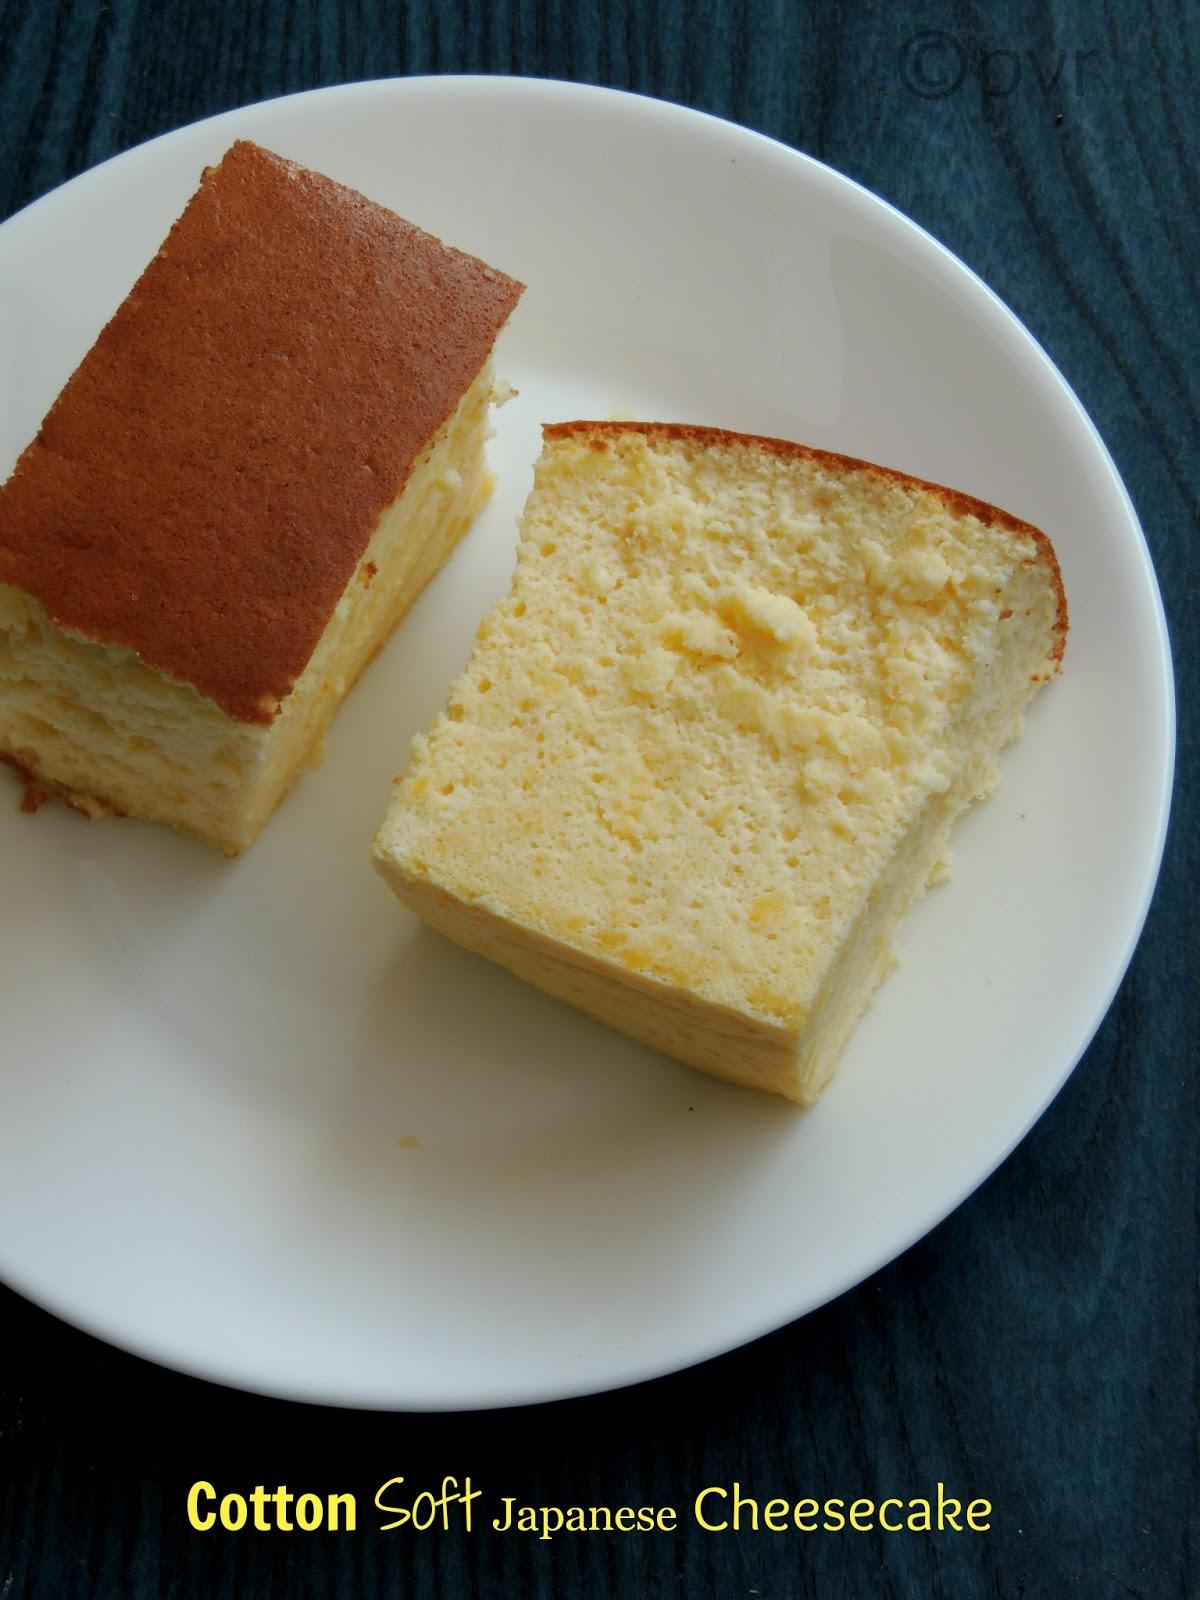 Priya S Versatile Recipes Cotton Soft Japanese Cheesecake